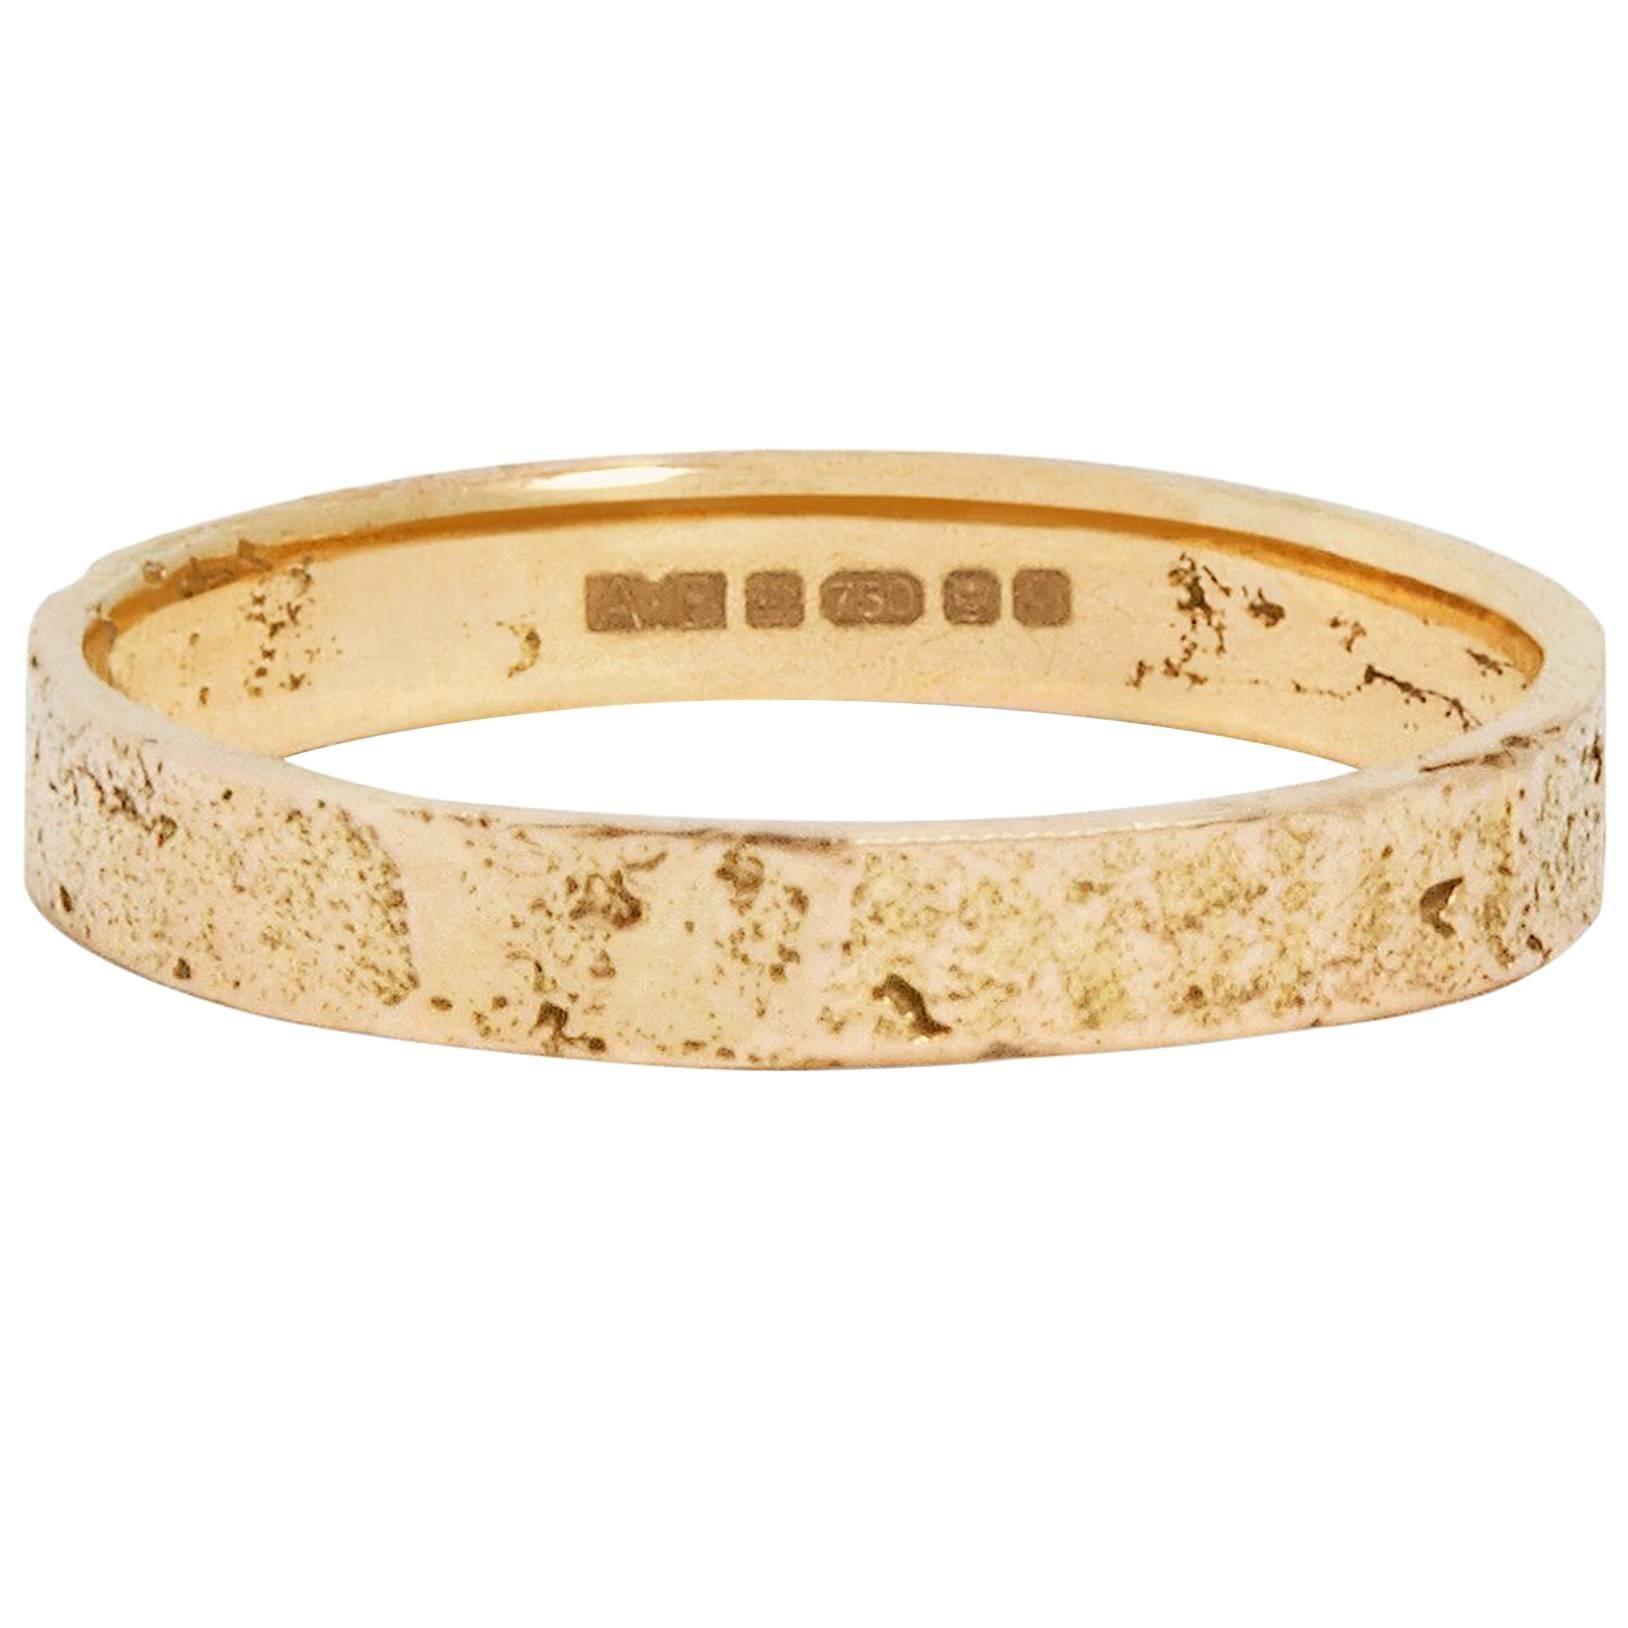 Paper Ring in 18 Karat Gold by Allison Bryan